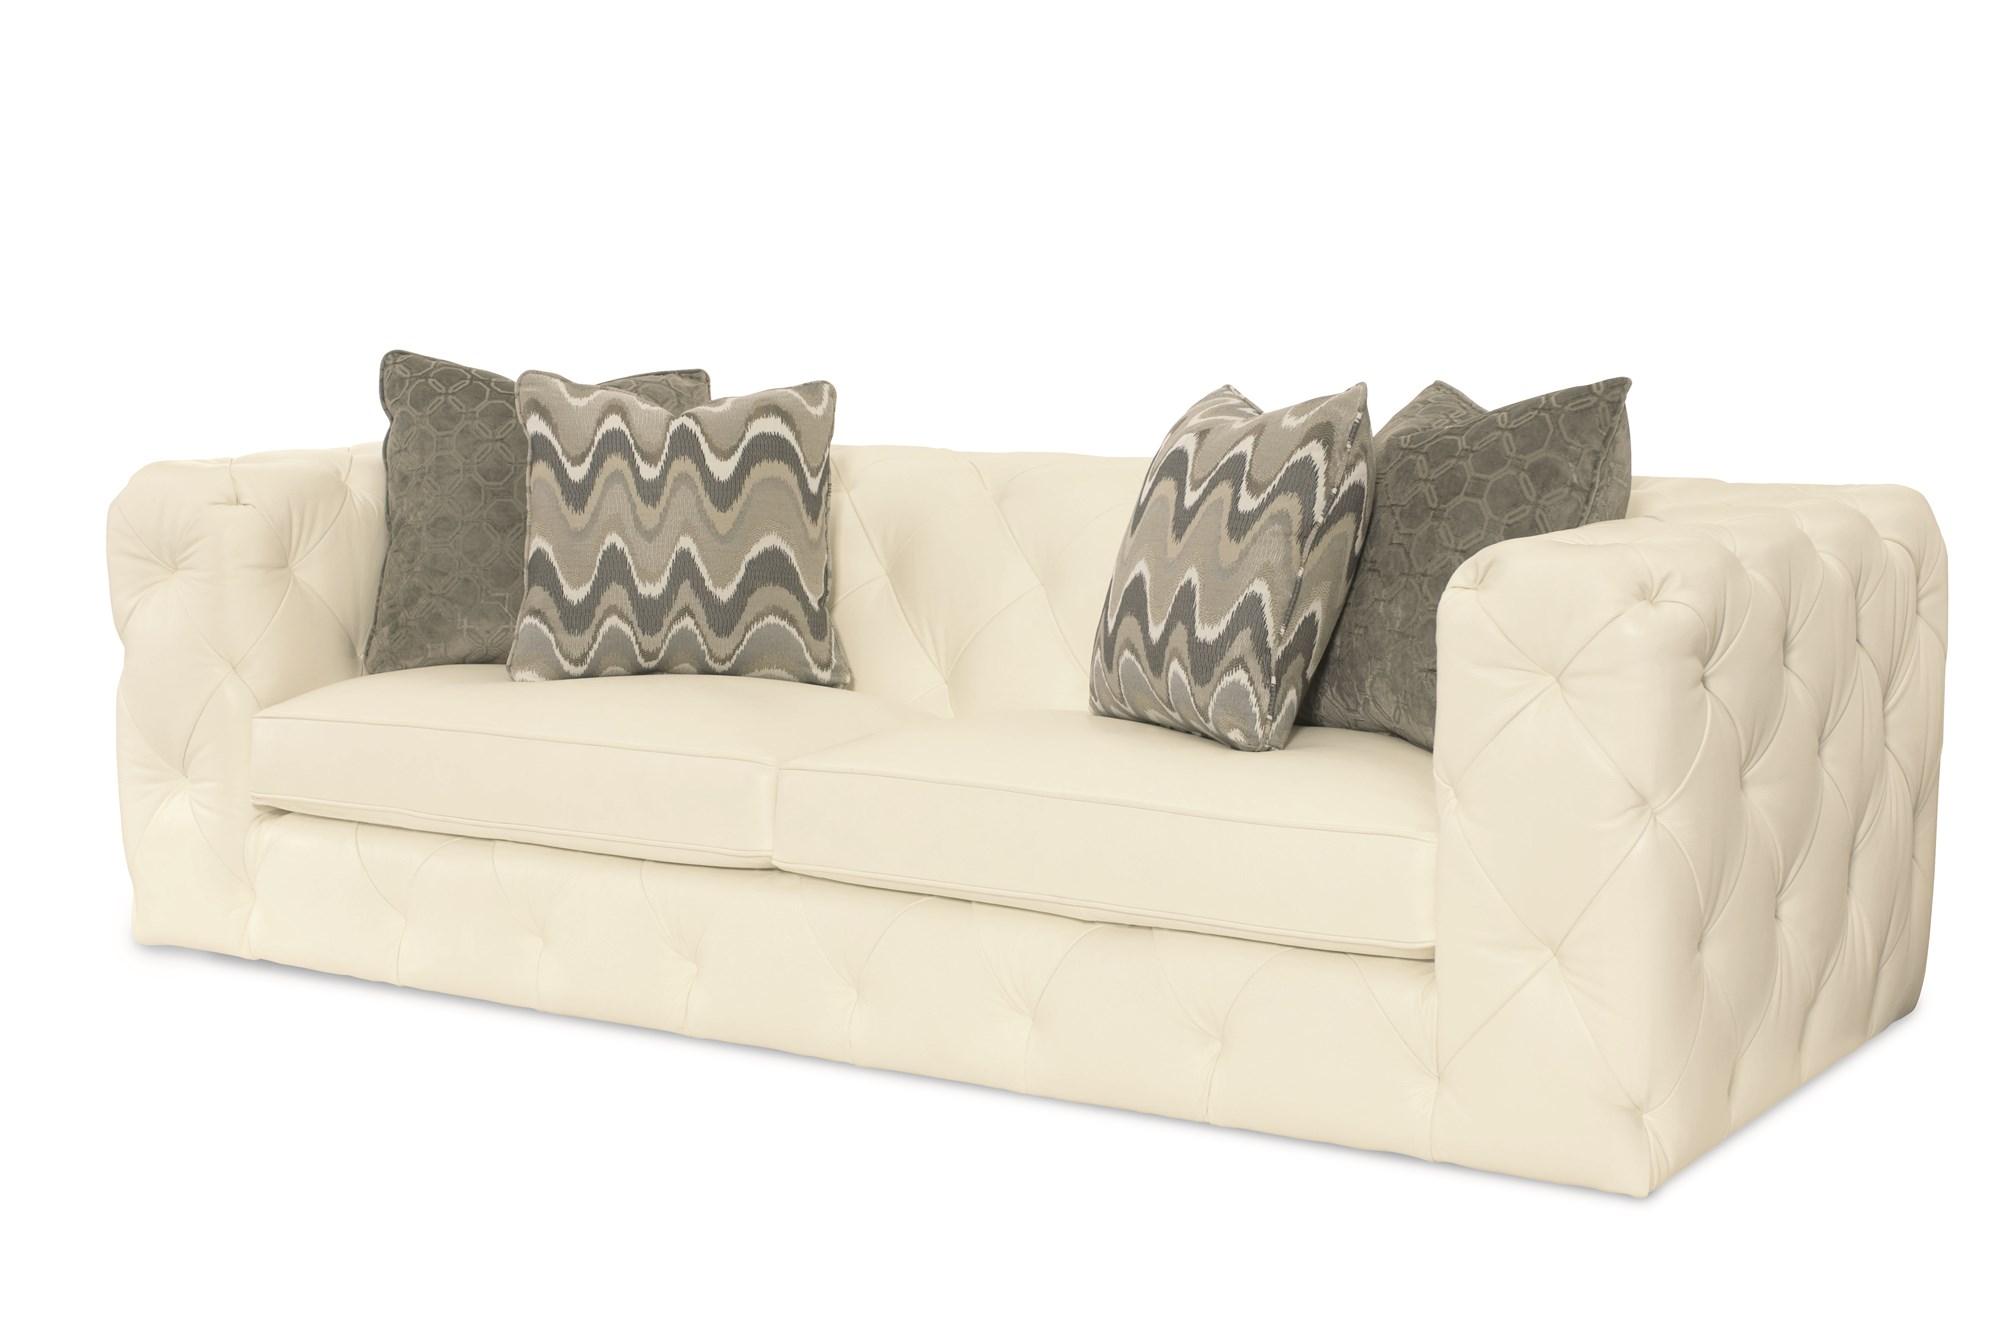 Tufted Chelsea Leather Sofa Sofas Loveseats Living